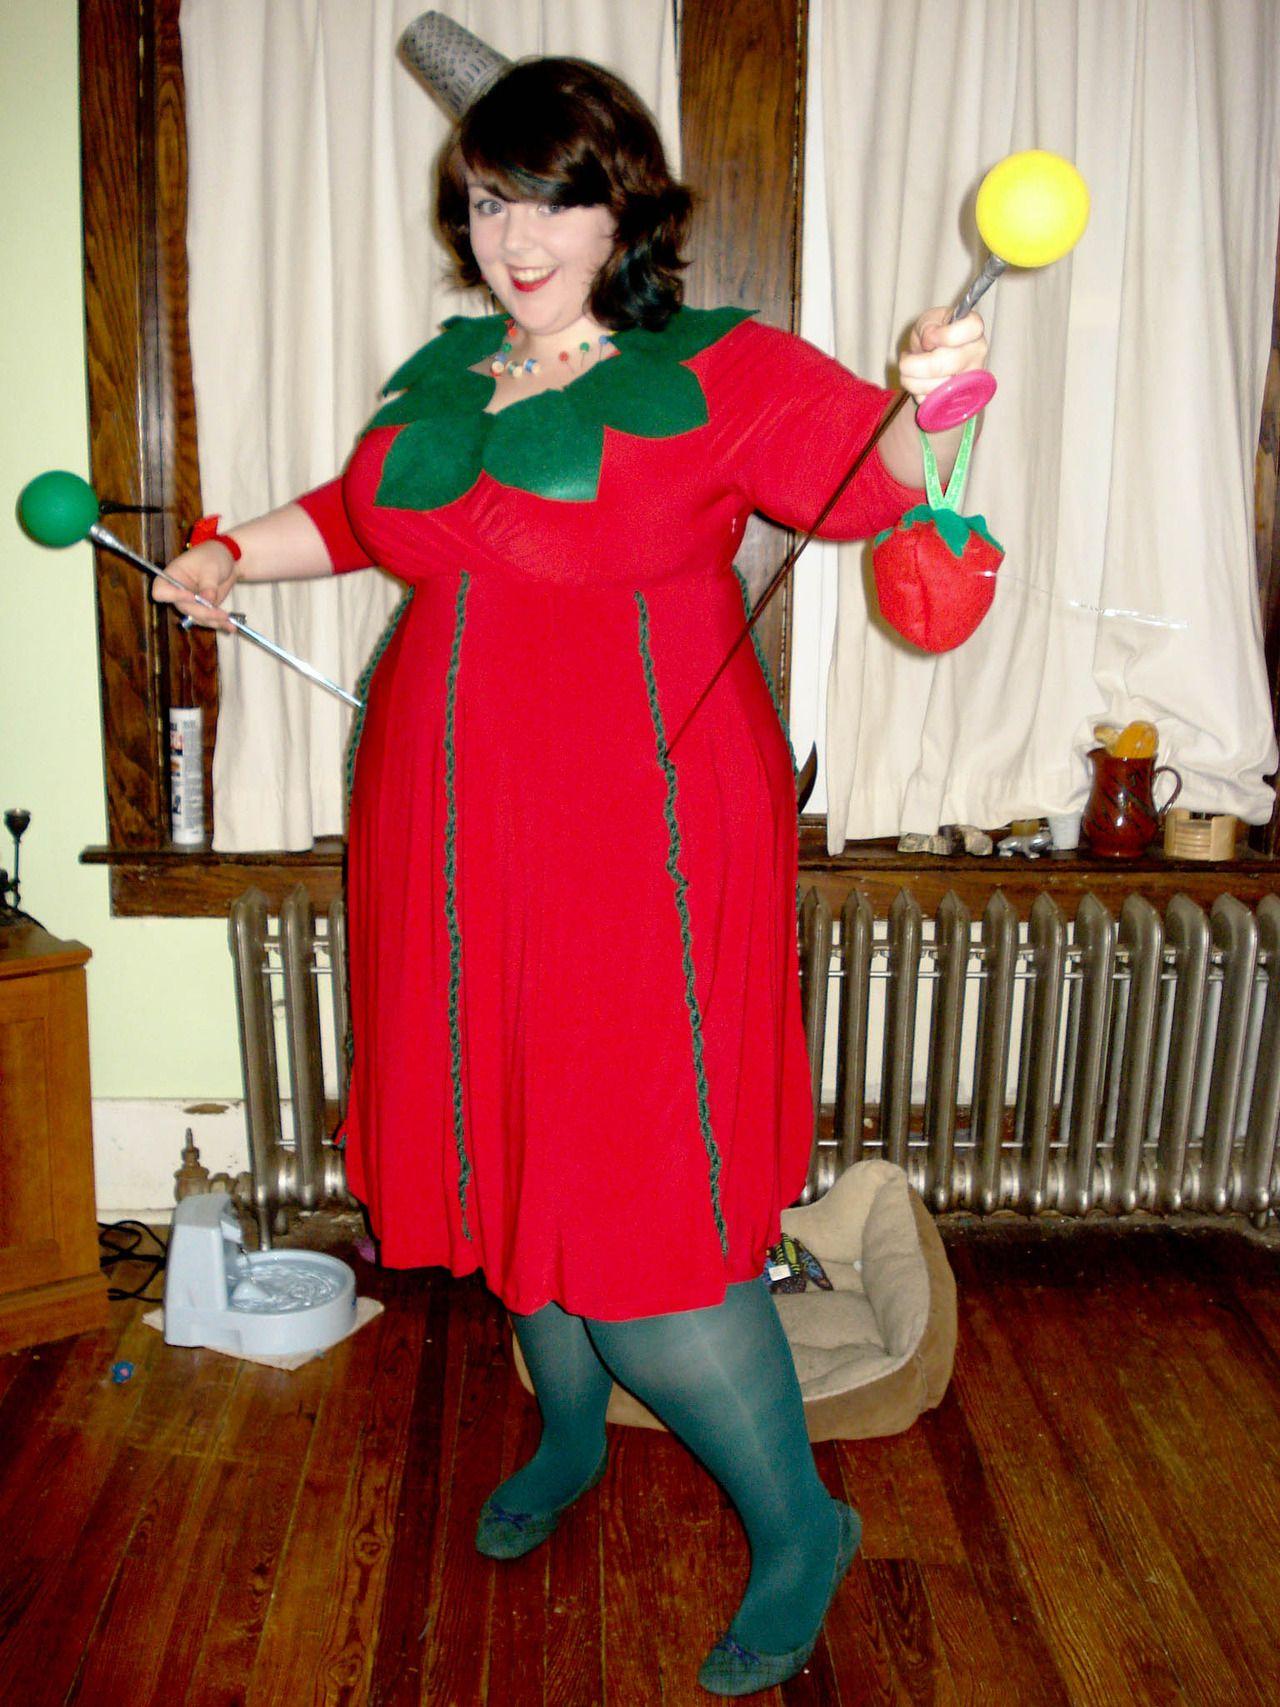 me halloween diy costume costumes handmade halloween pin cushion tomato pin cushion plus size costume